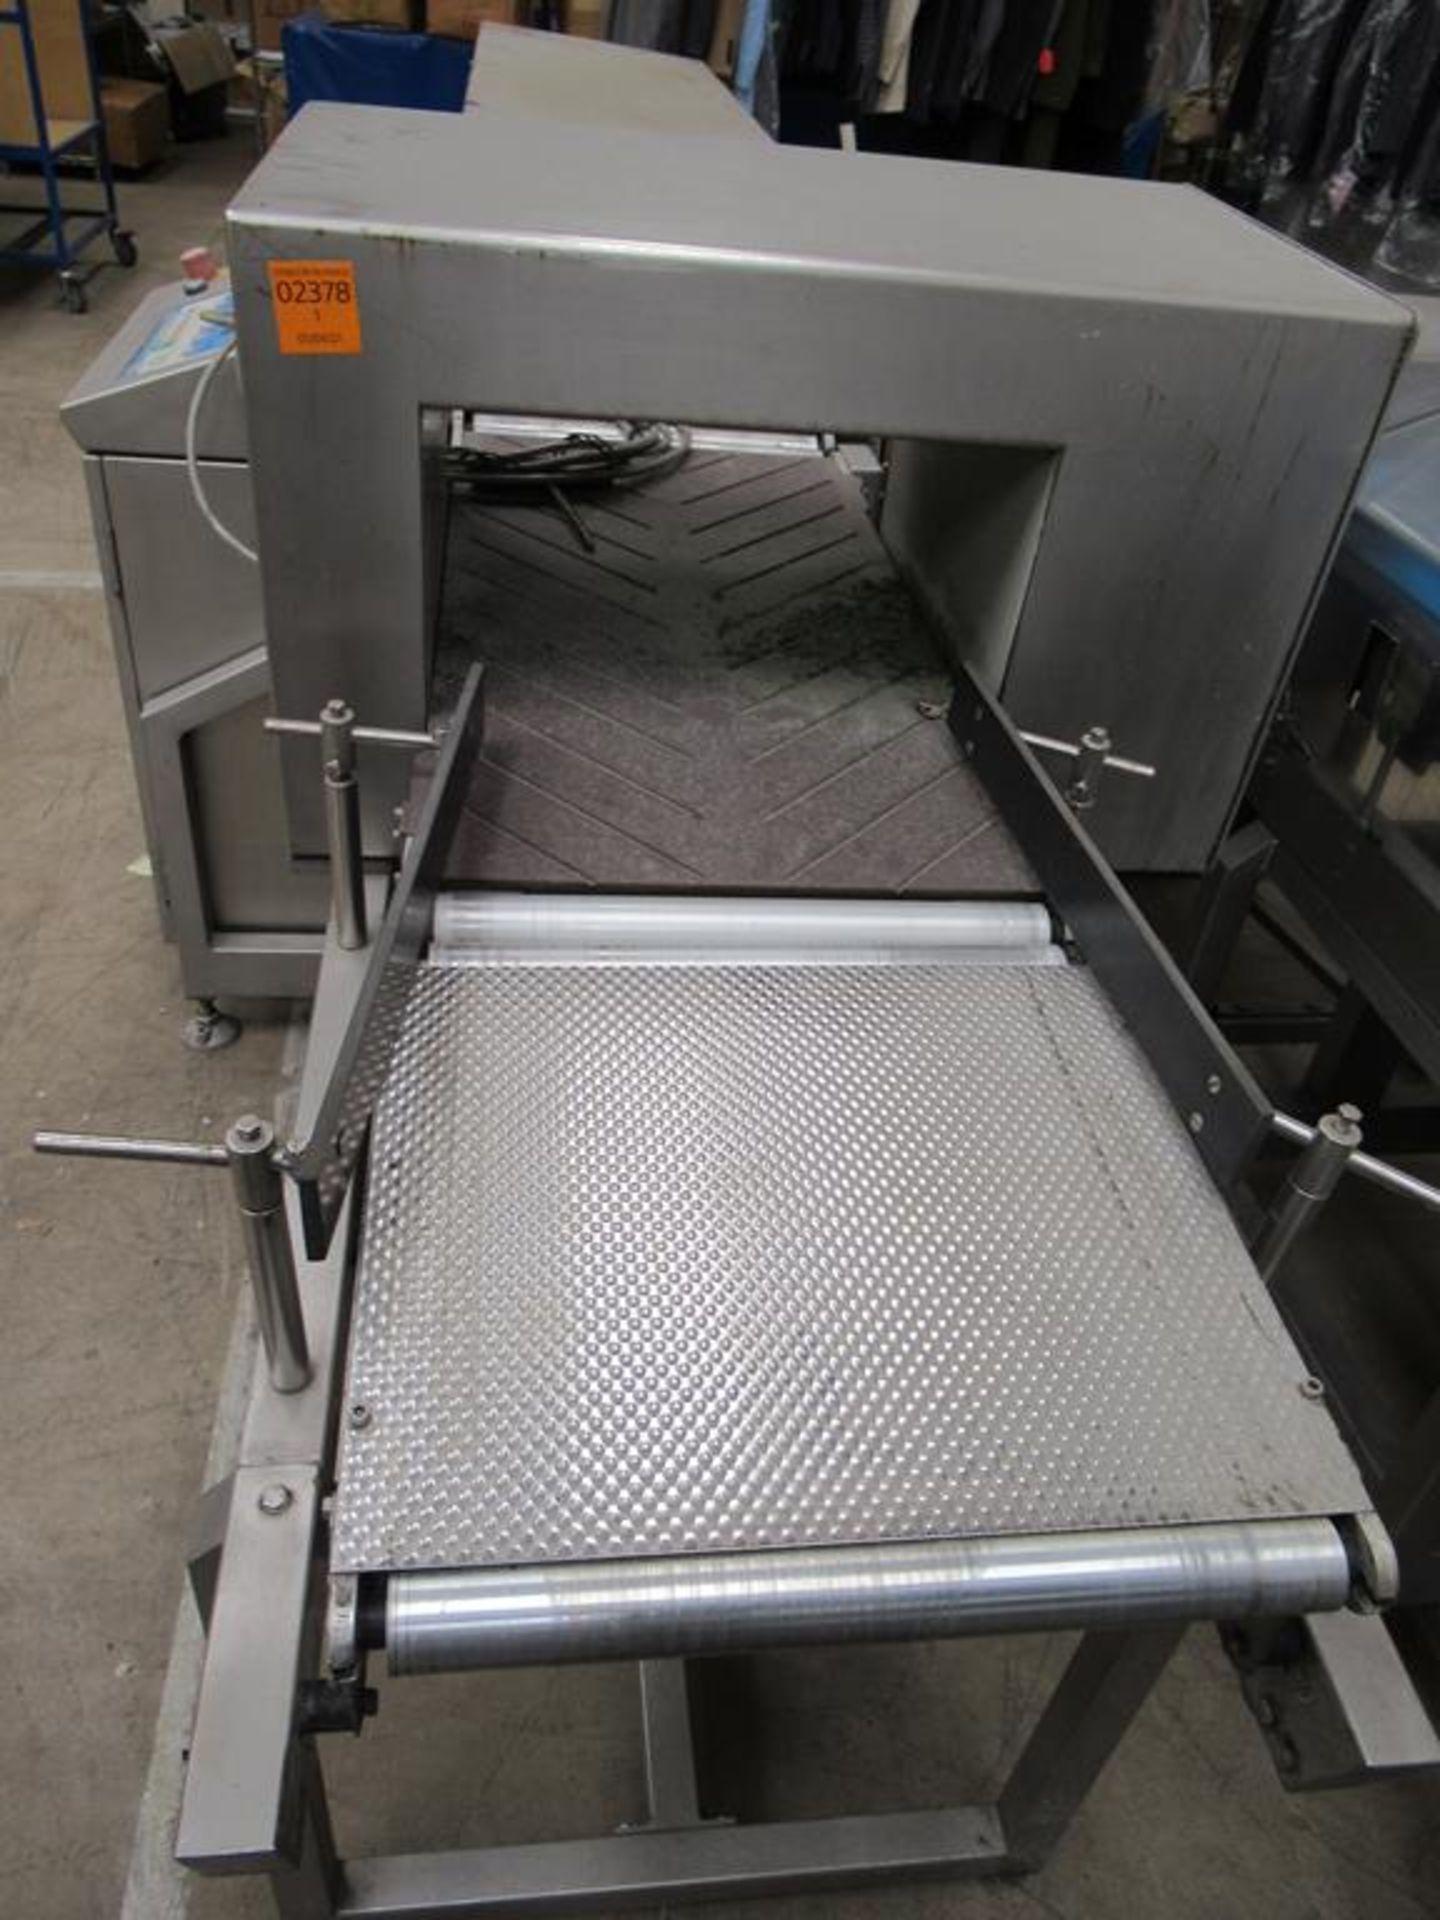 Loma 7000 Metal Detecting Conveyor - Image 5 of 7